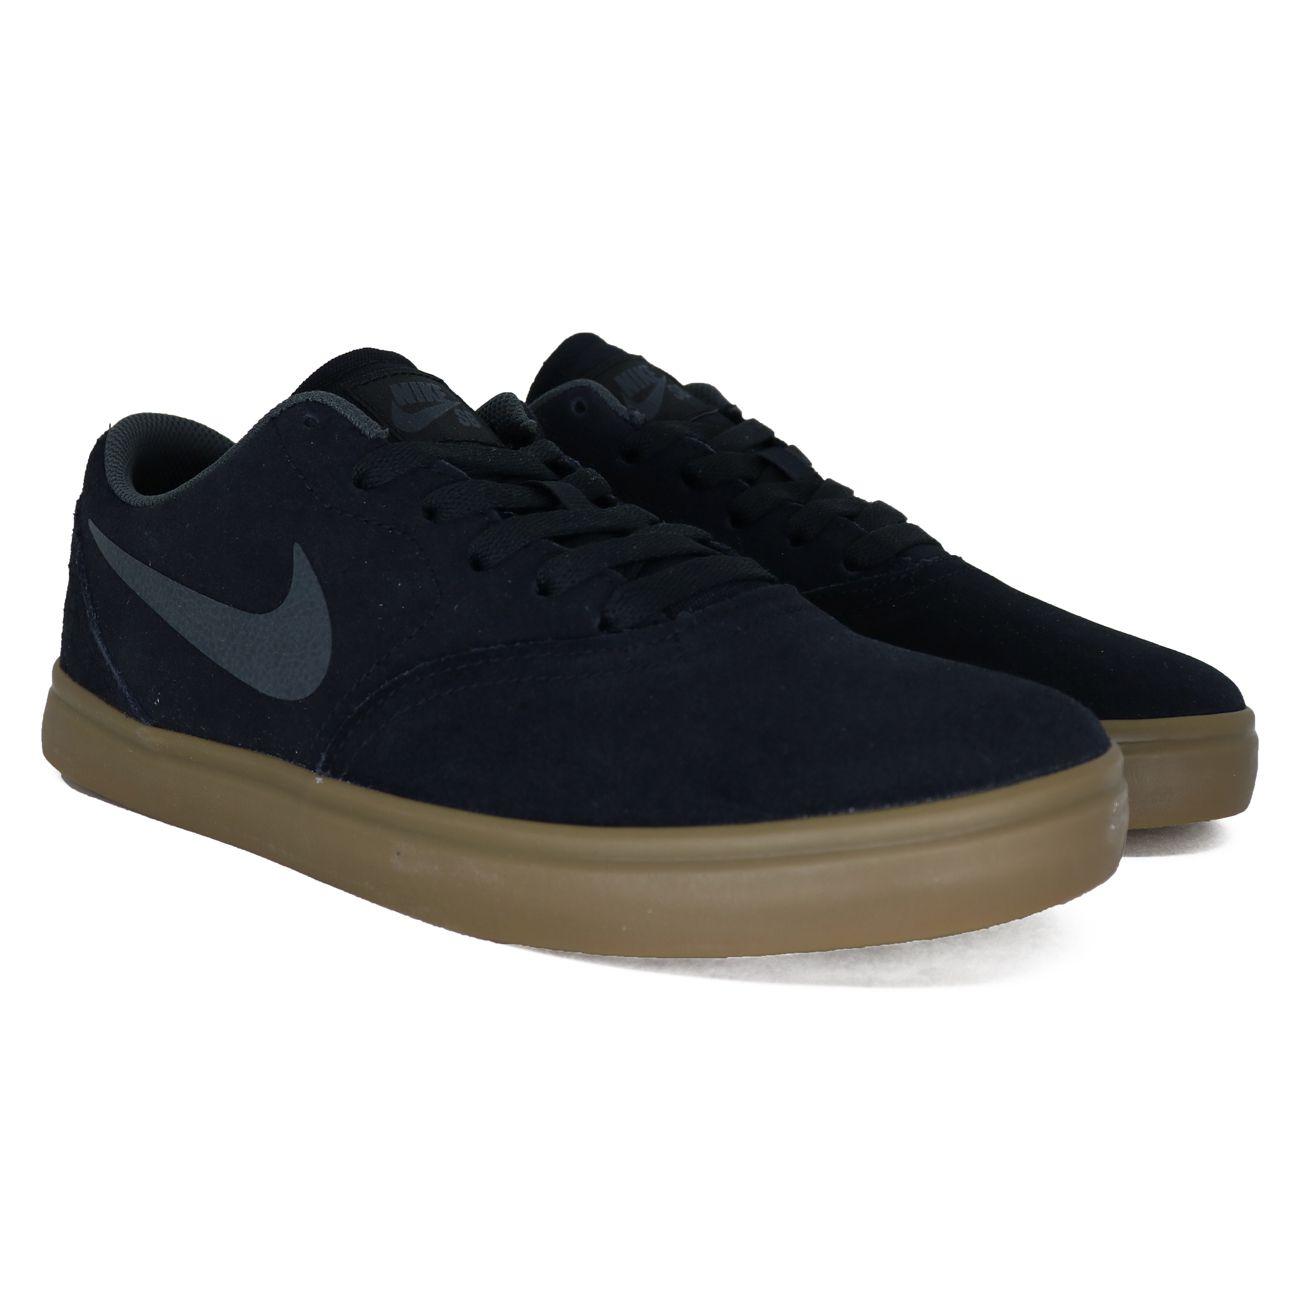 Tênis Nike SB Check Preto E Cinza